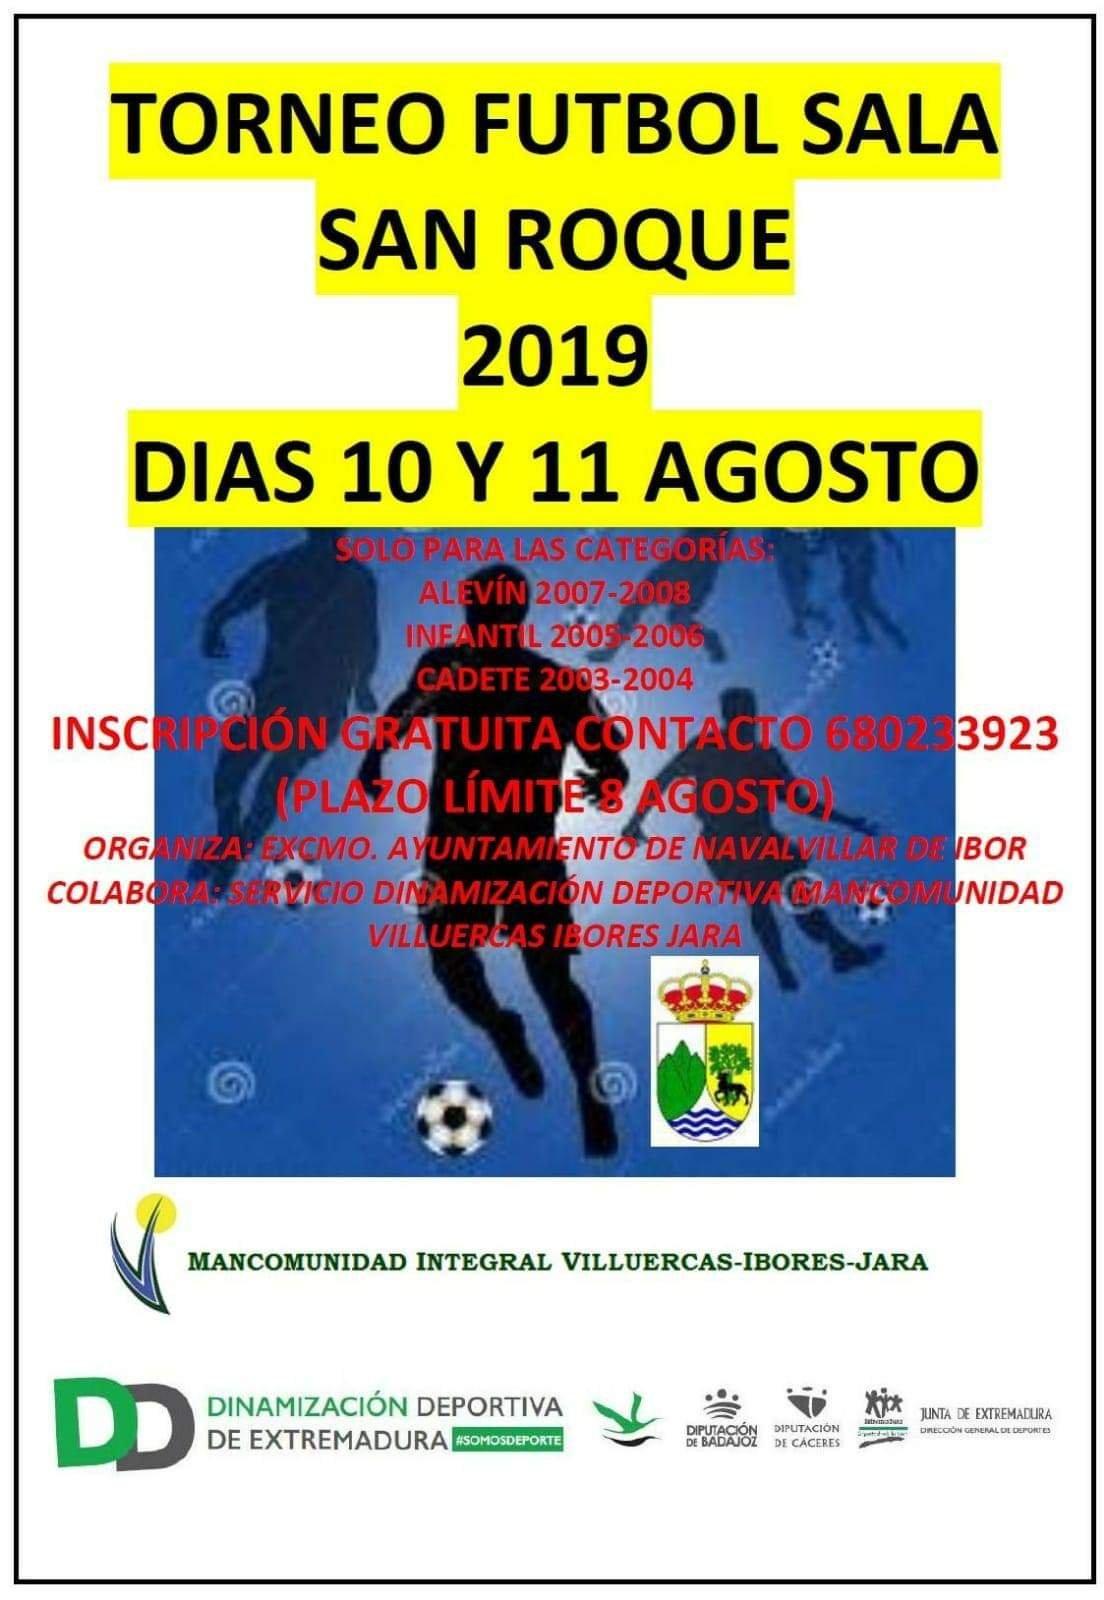 Torneo de fútbol sala San Roque 2019 - Navalvillar de Ibor (Cáceres)